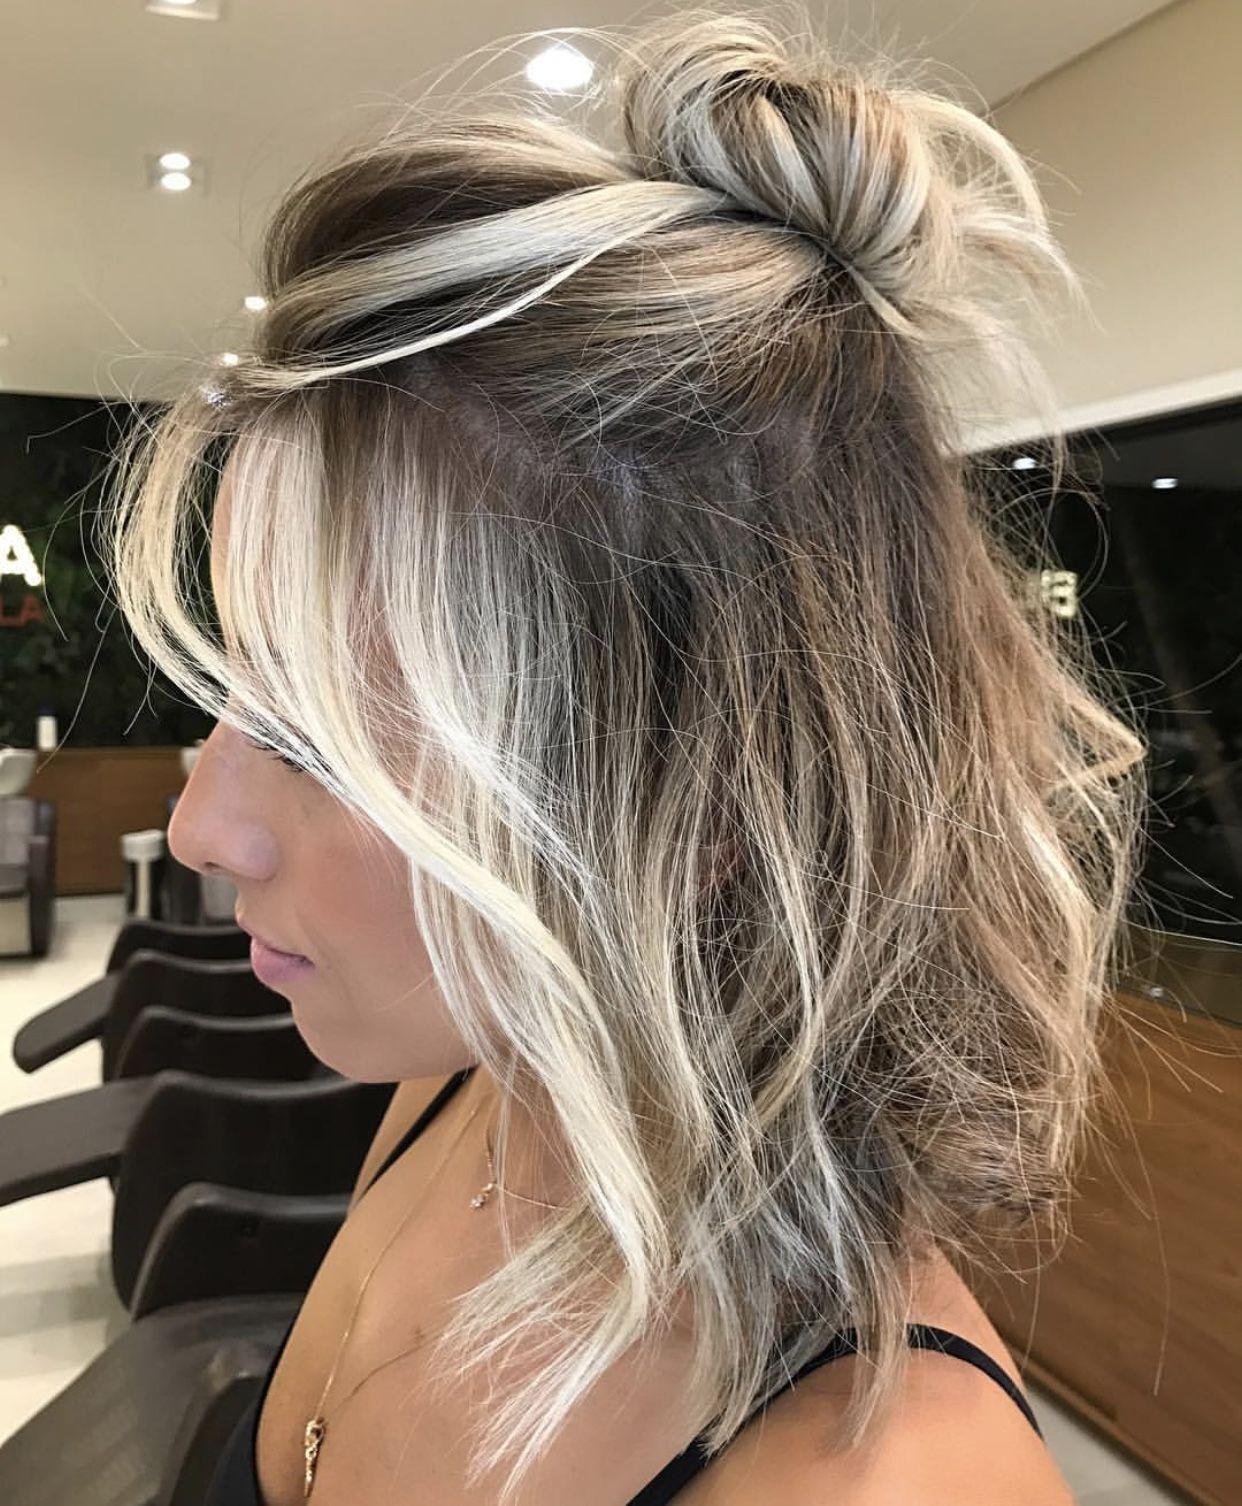 Perfect Half Up Half Down Hairstyle Halfuphalfdown Hairstyleideas